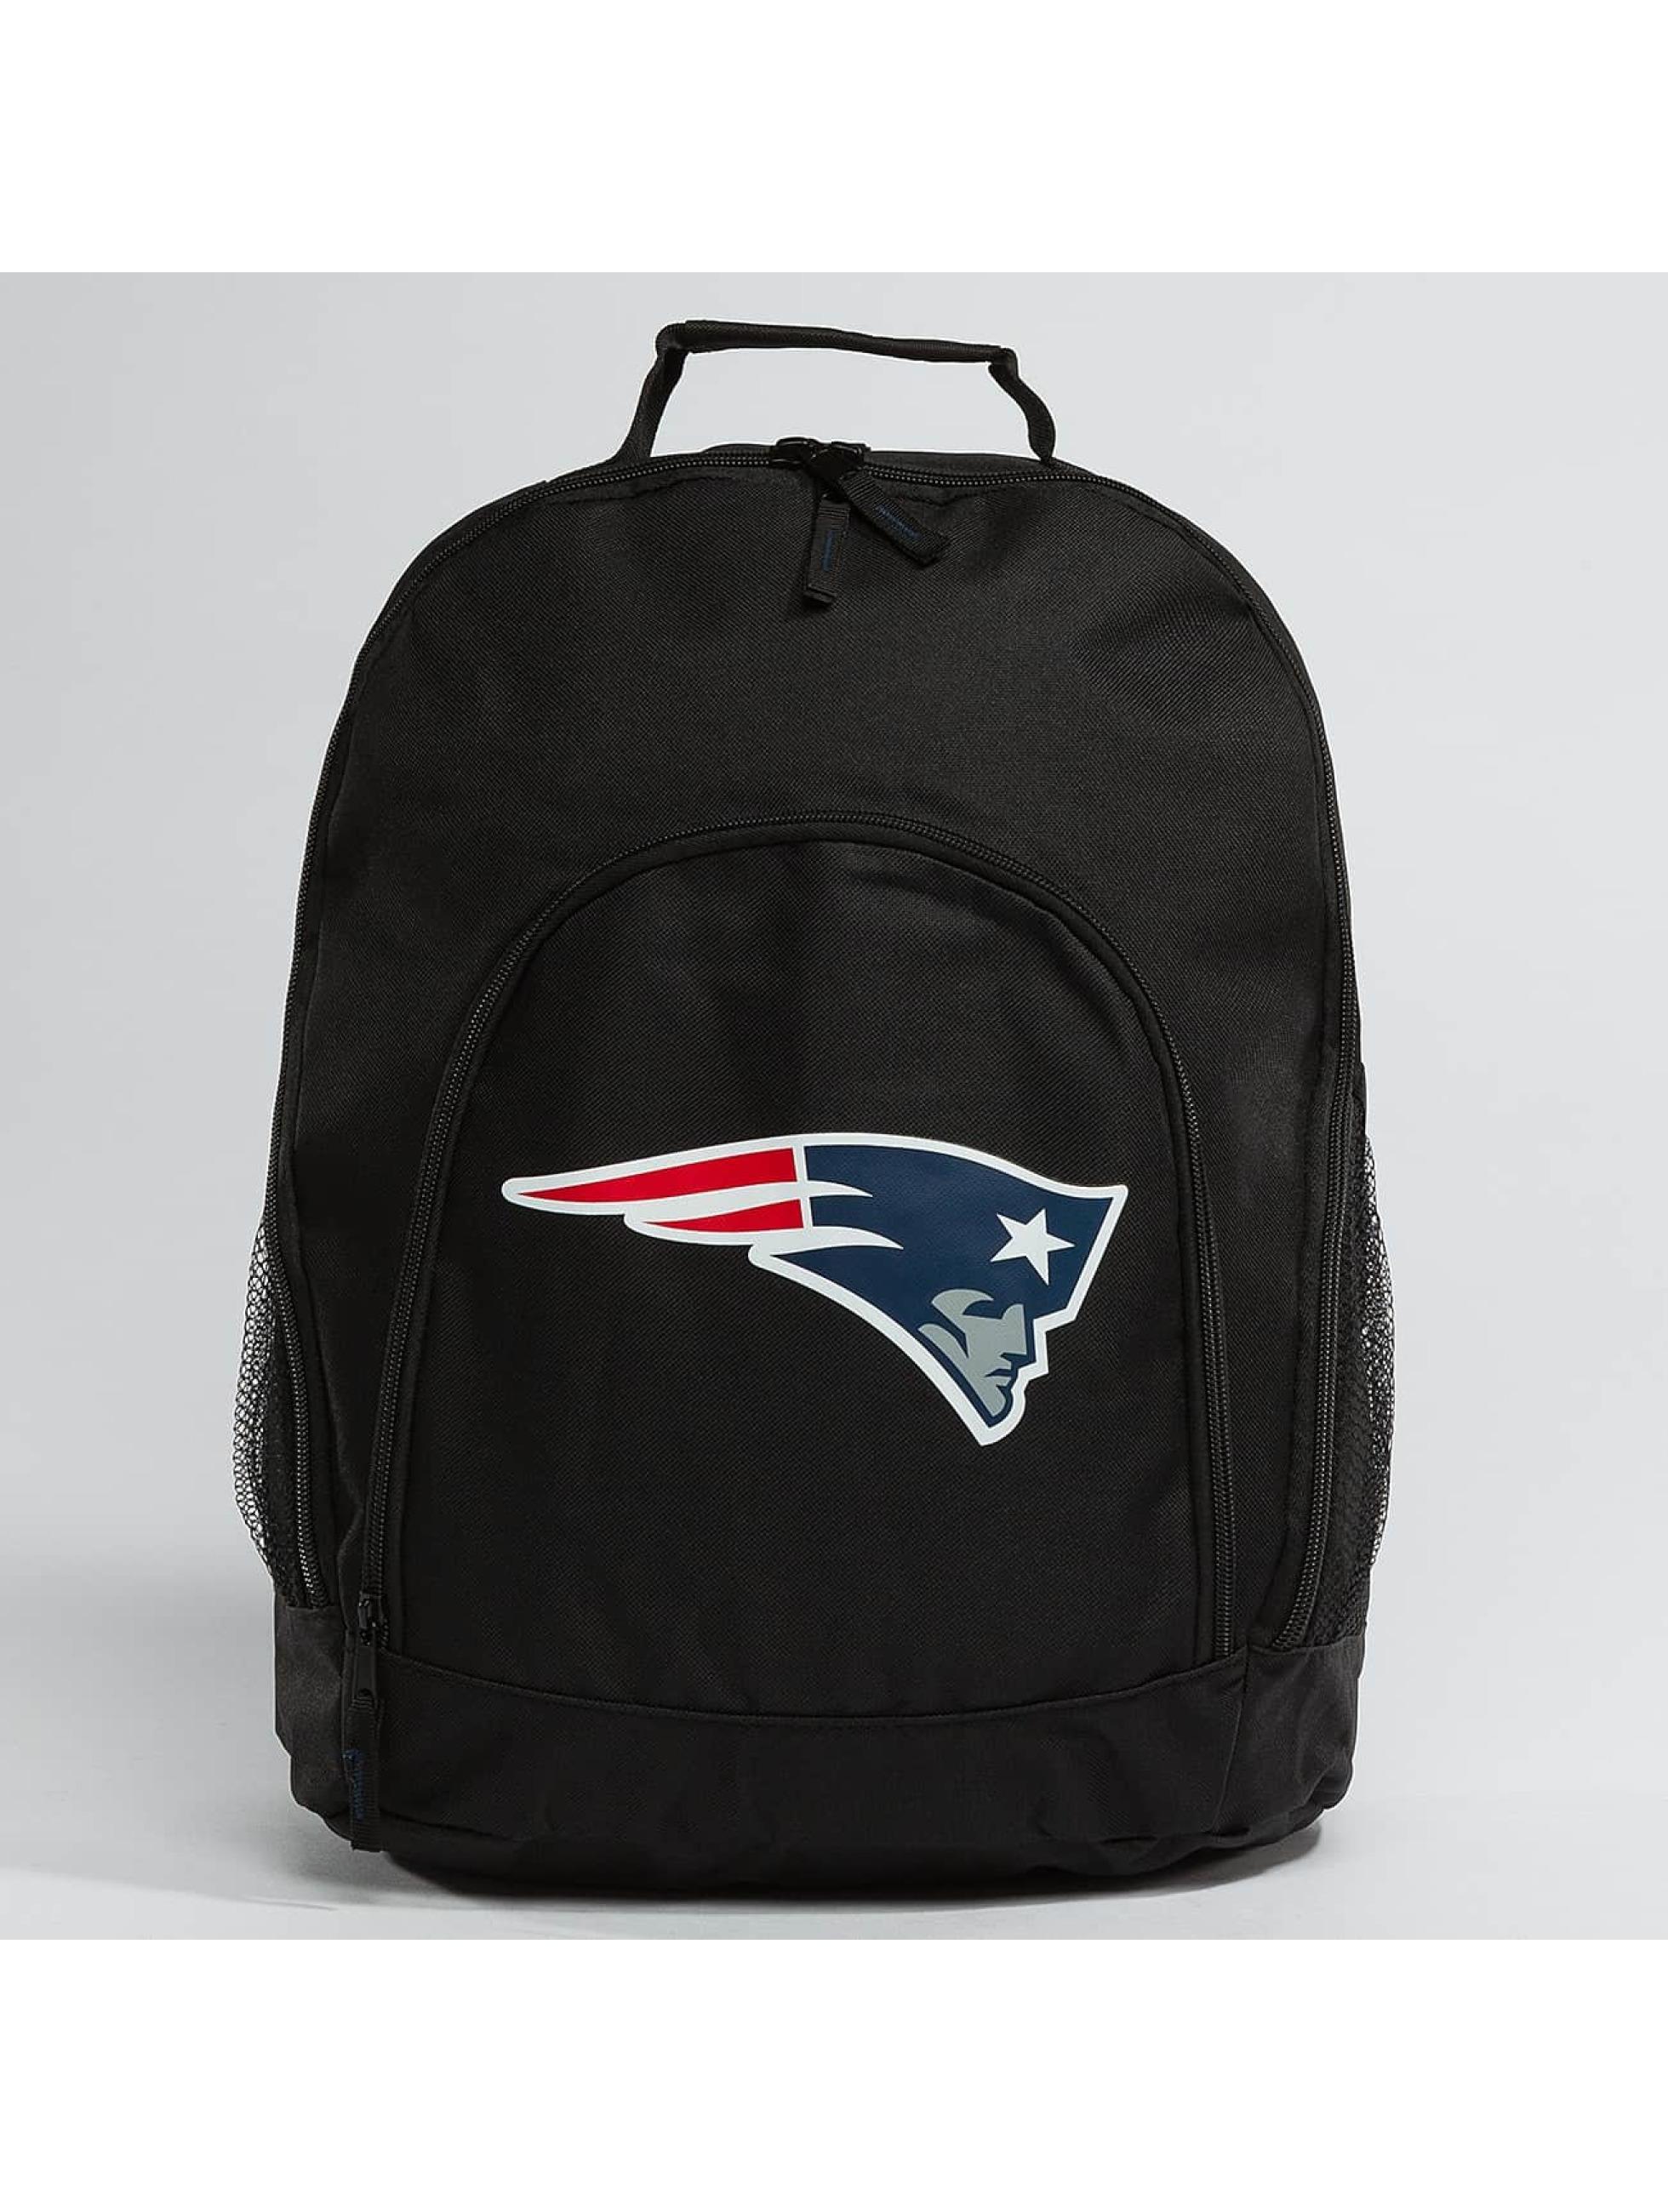 Forever Collectibles Sac à Dos NFL New England Patriots noir